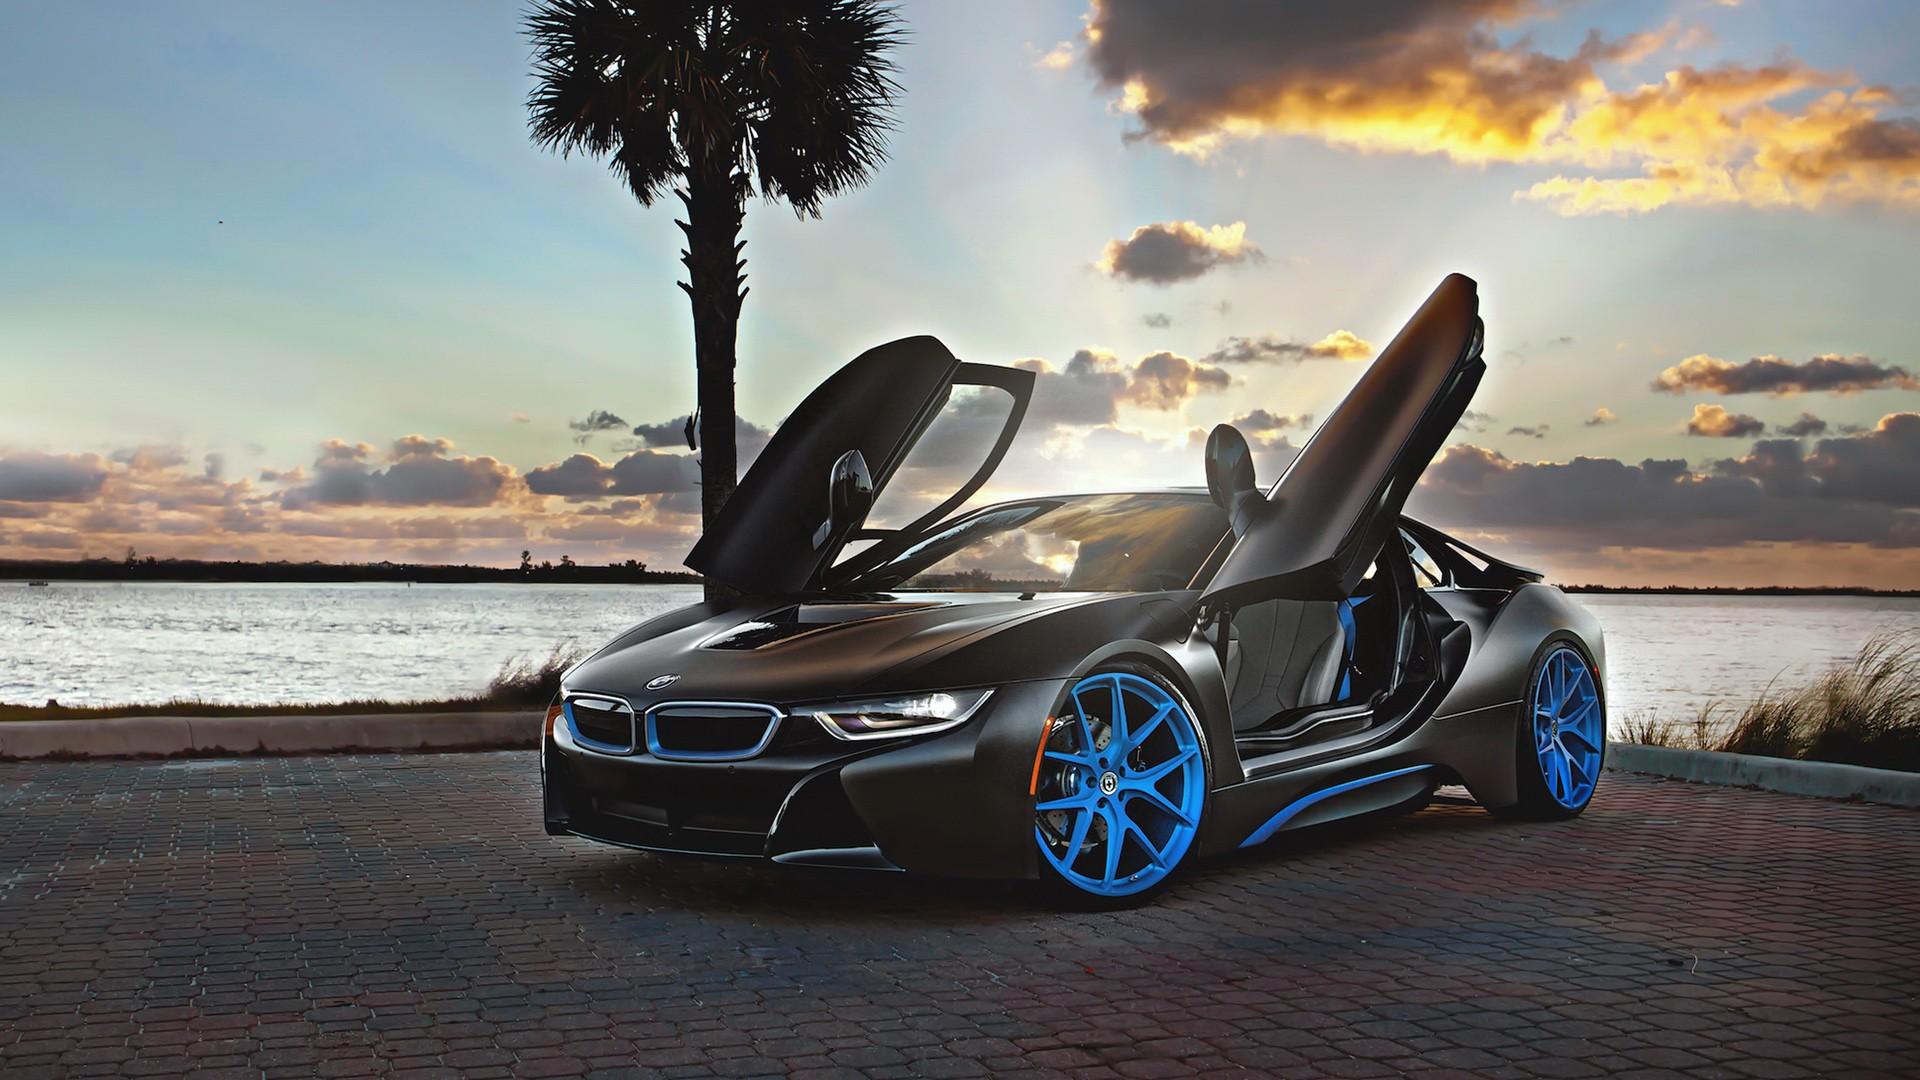 Bmw I8 Car Concept 4k Hd Desktop Wallpaper For 4k Ultra Hd: BMW I8 Blue HRE Wheels Wallpaper